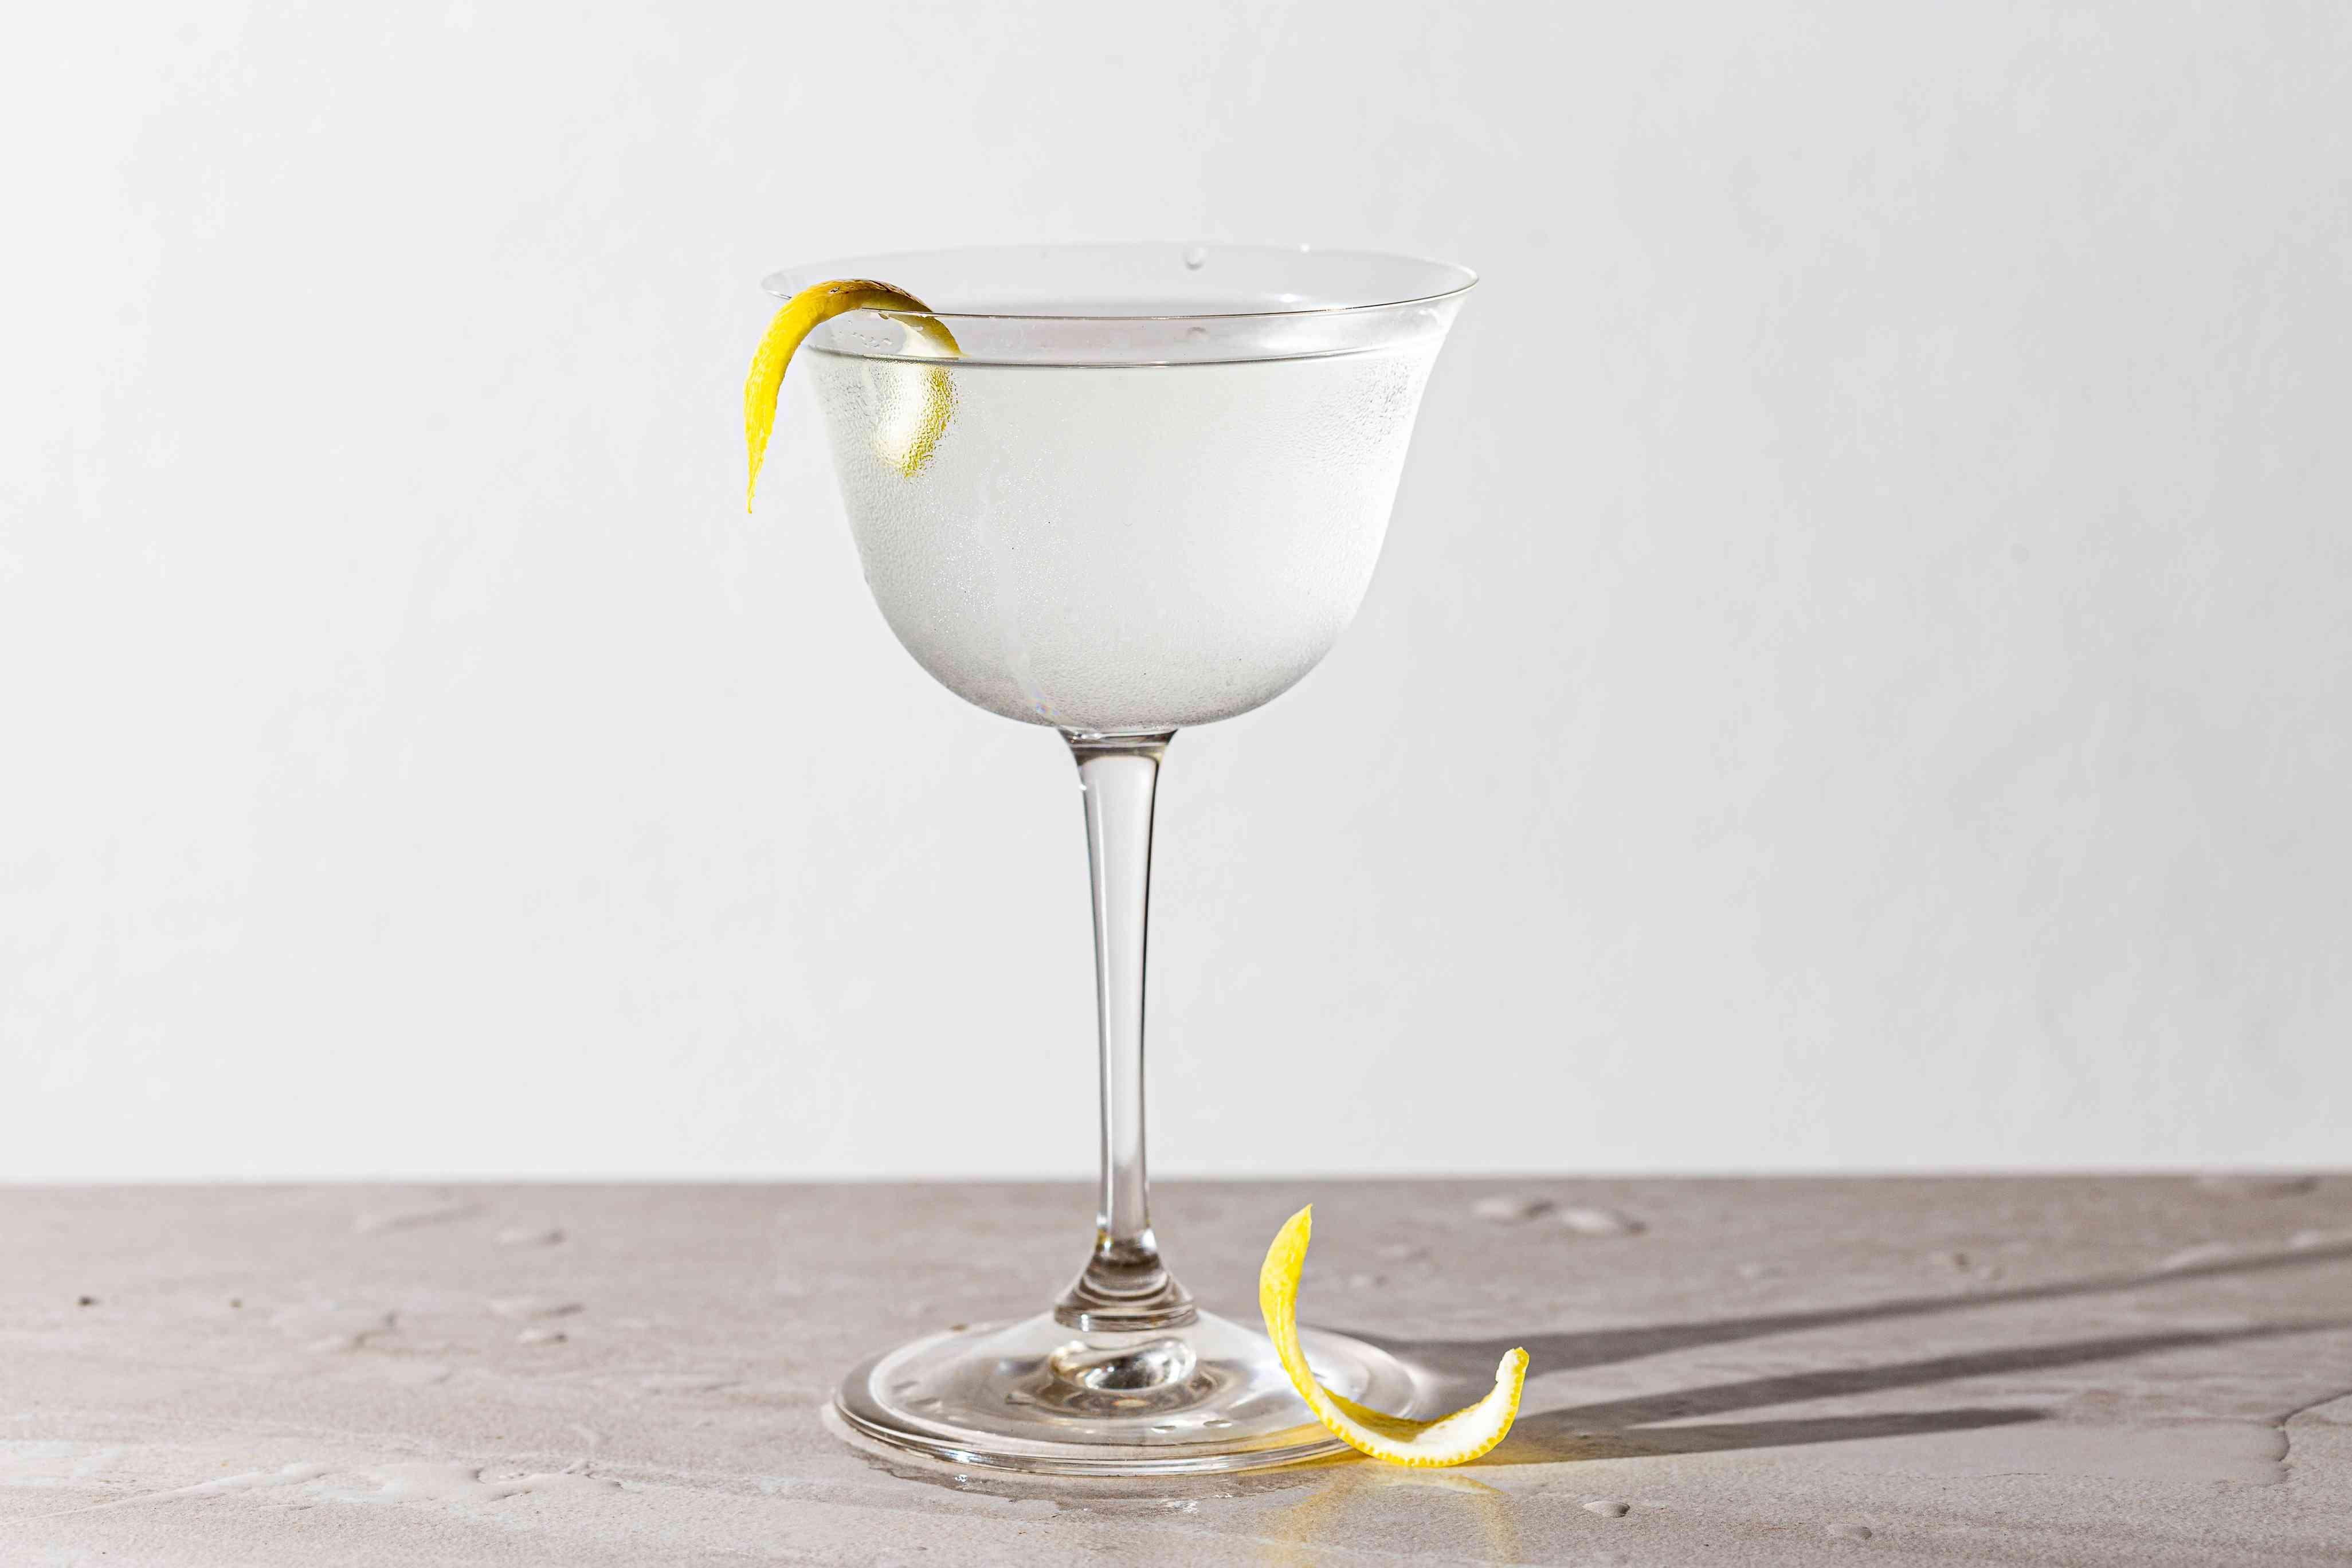 Vodka martini in a glass with lemon peel